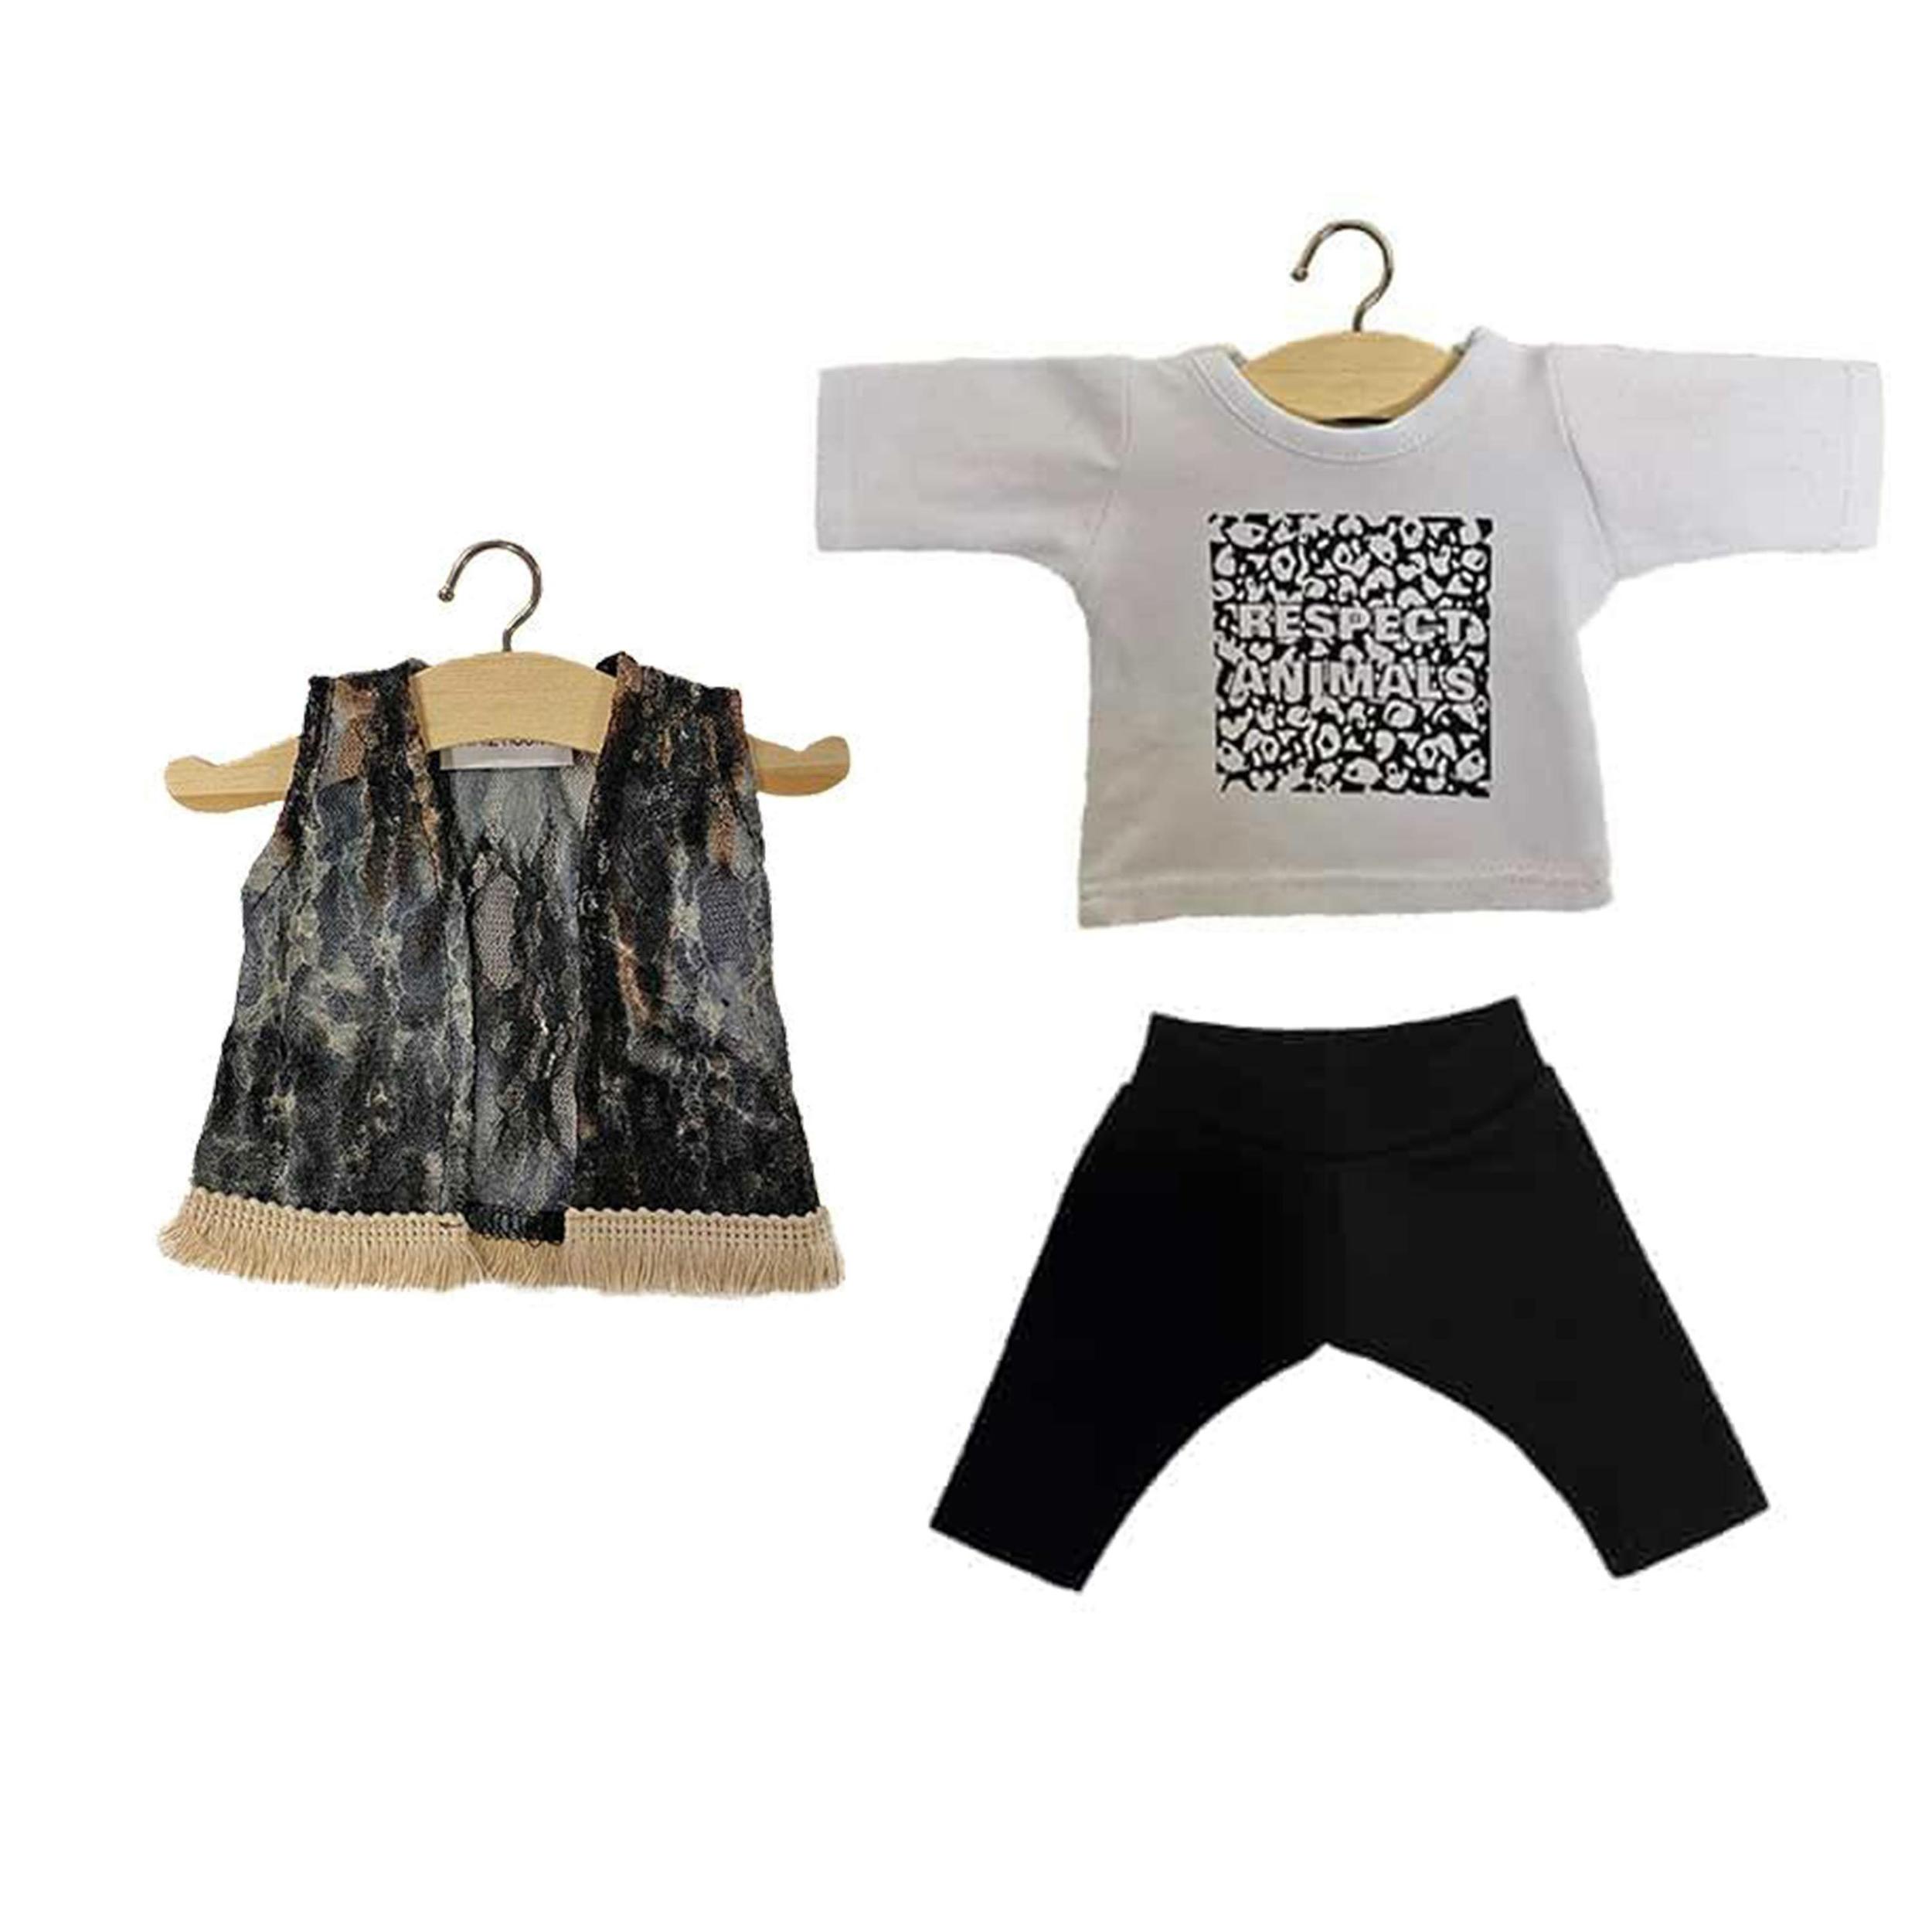 ensemble-gilet-tshirt-legging-minikane-petit-d-homme-valenciennes